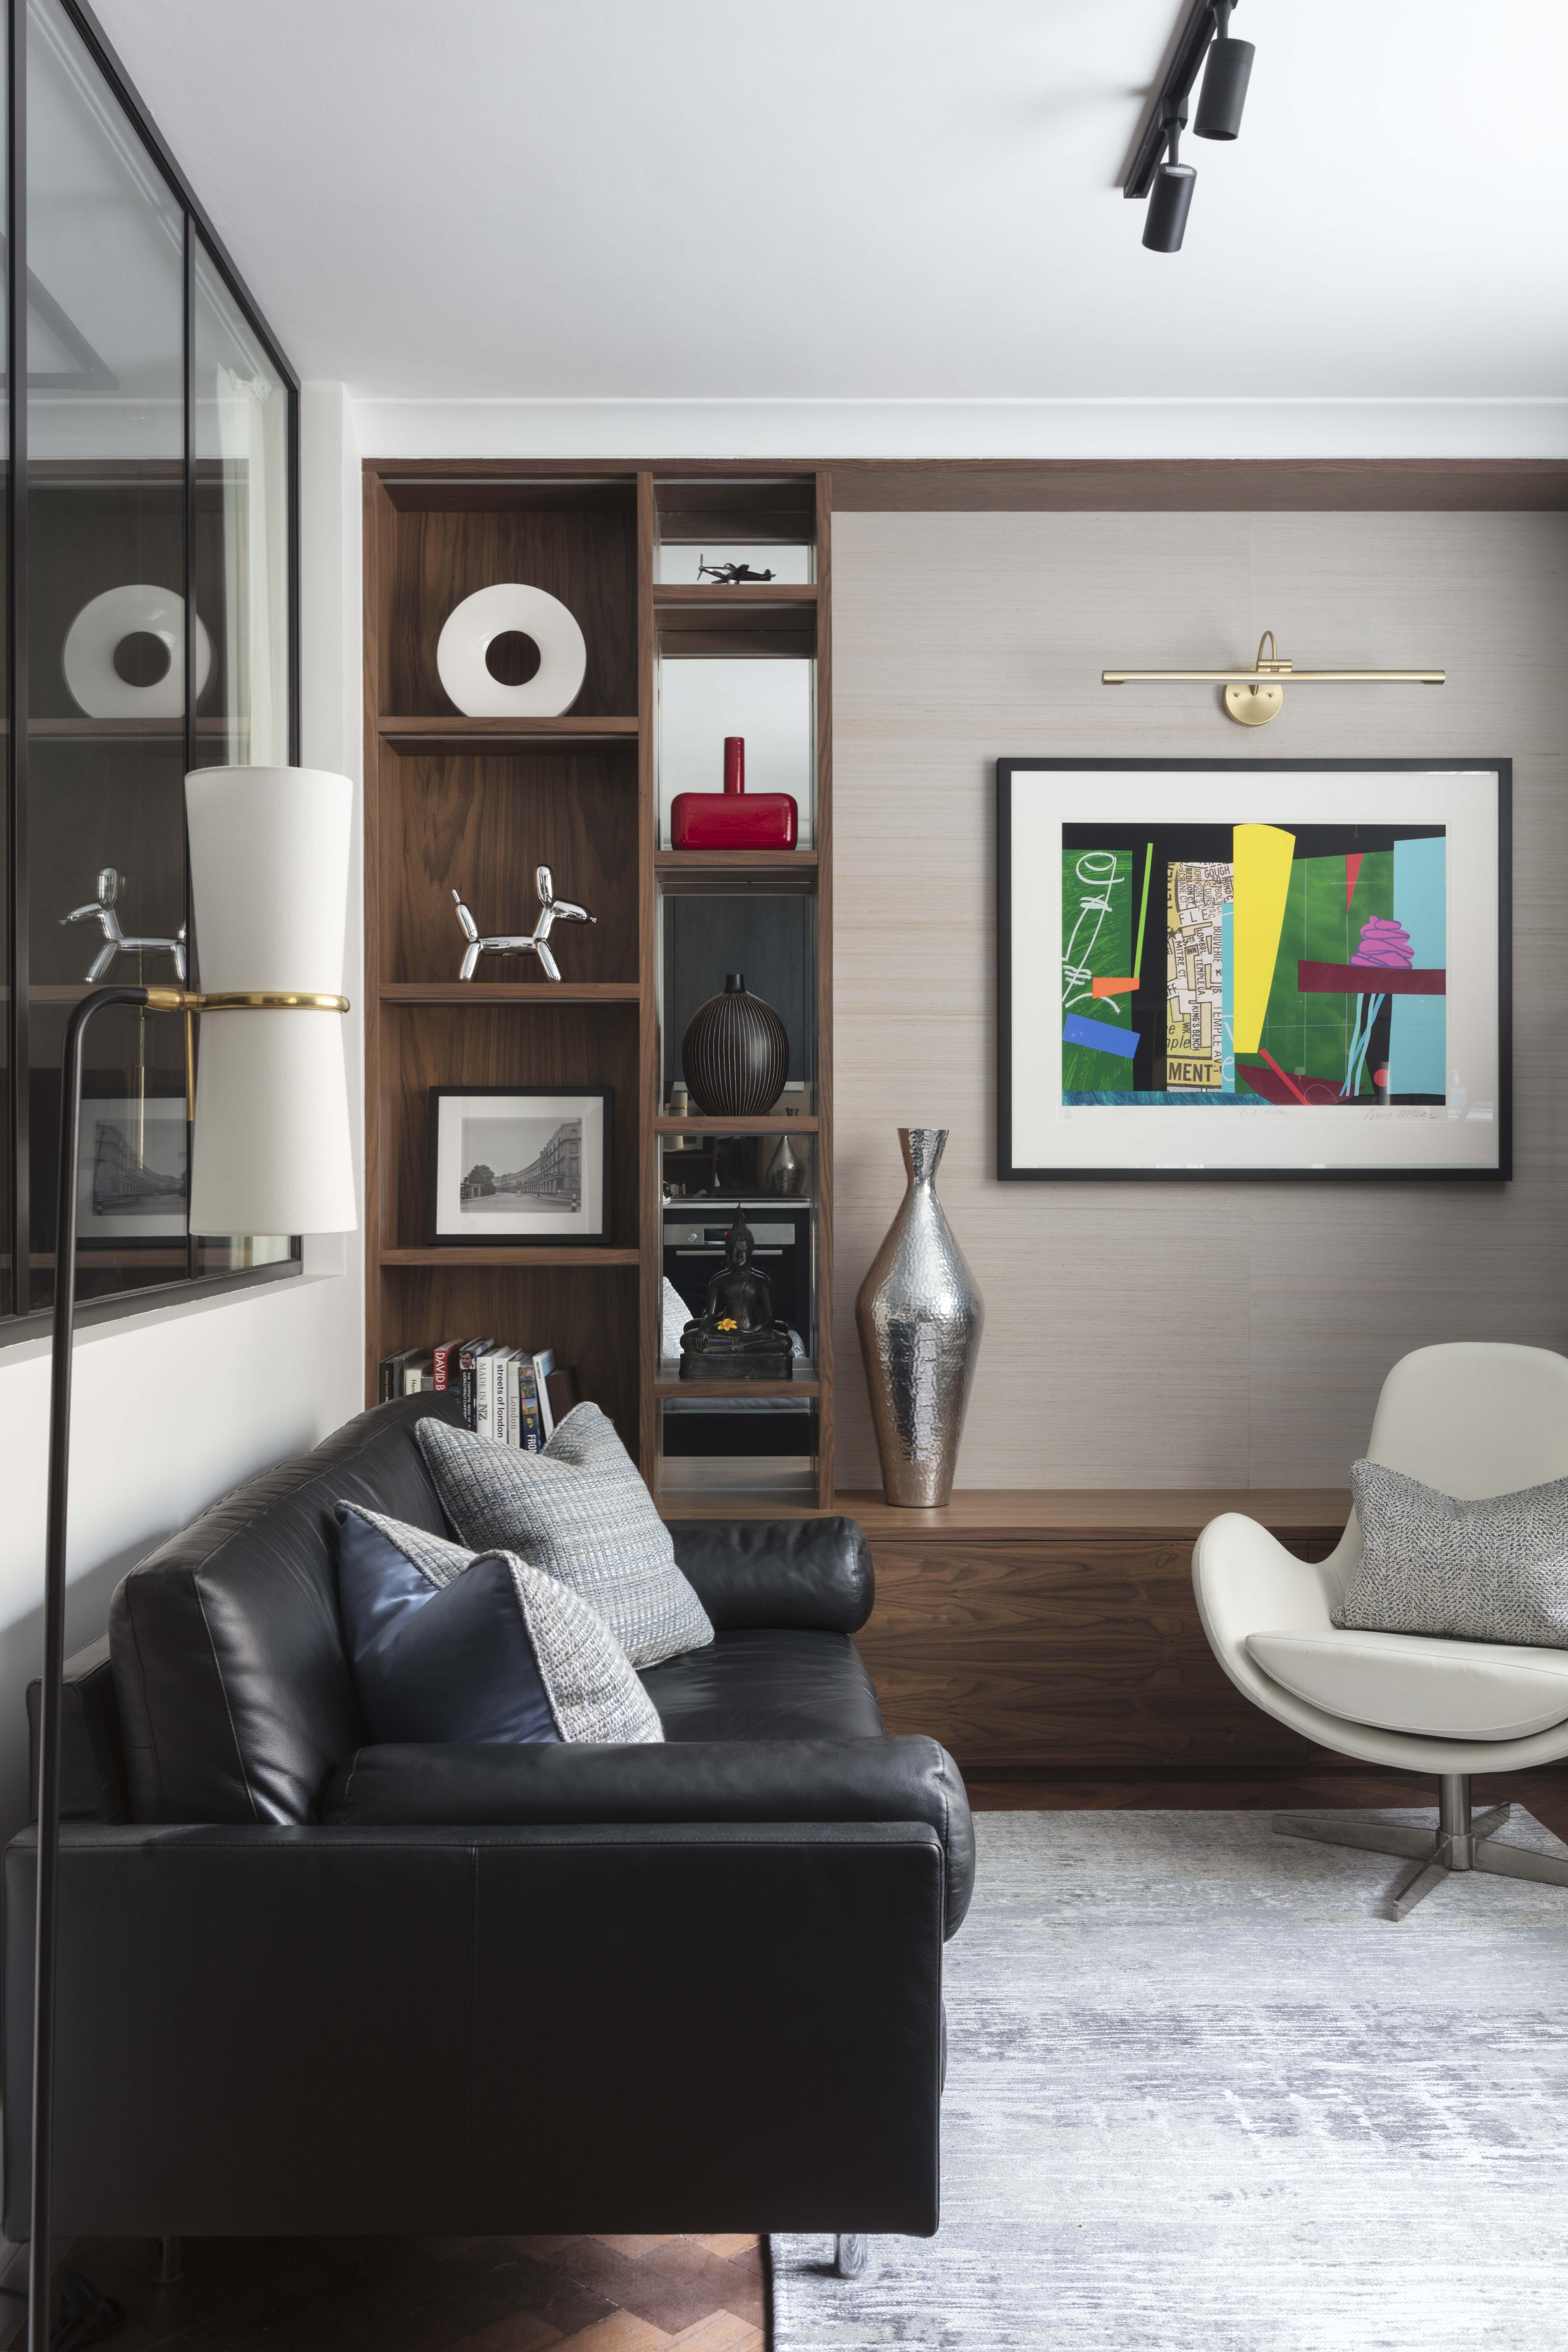 Regent Park Interior Designed Apartment by Shanade McAllister-Fisher Design